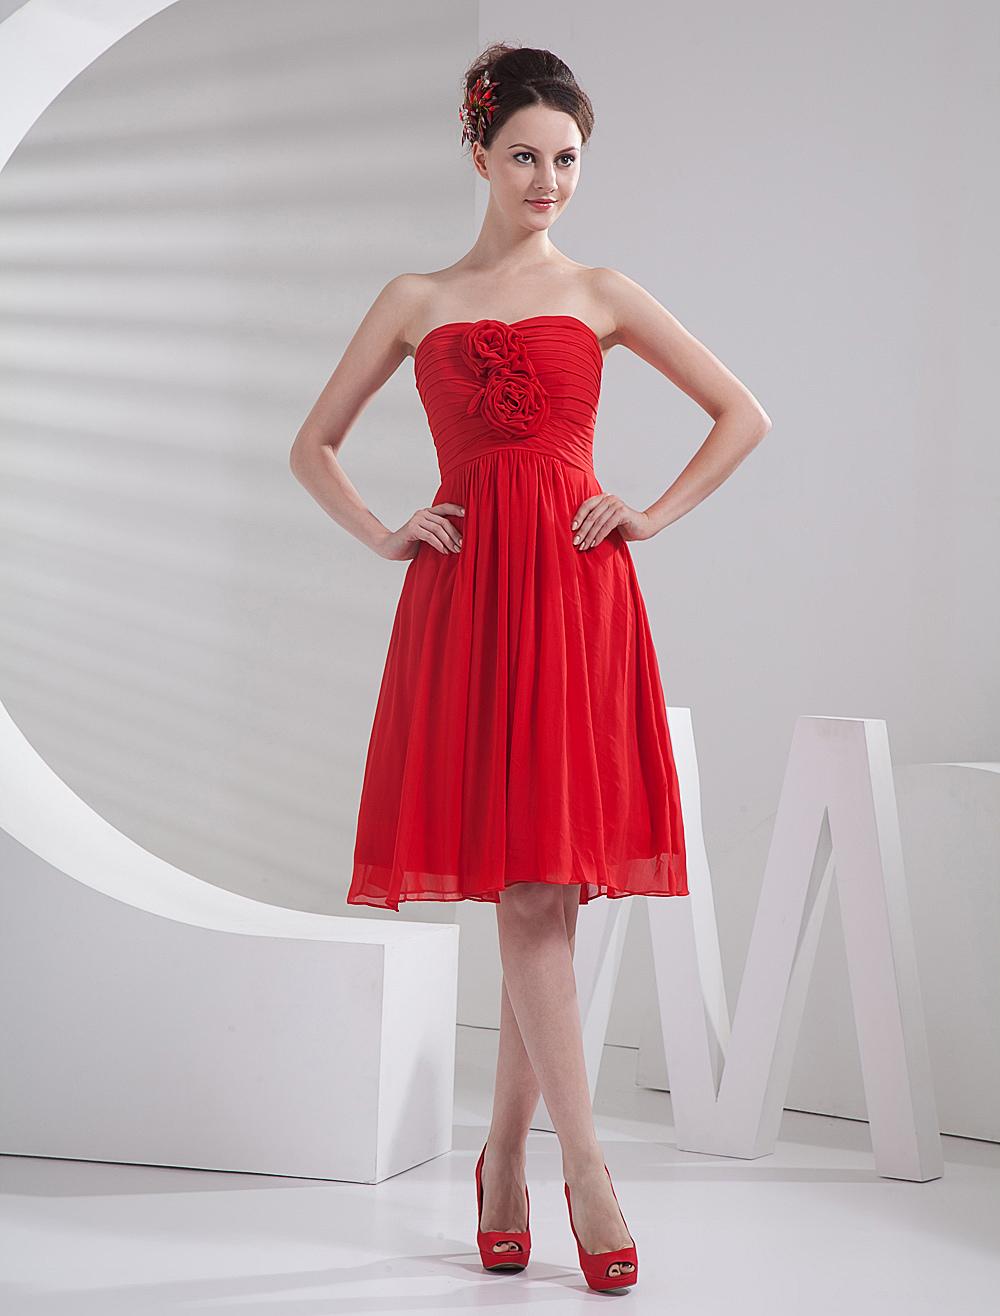 Red Chiffon Knee Length Flower Strapless Bridesmaid Dress